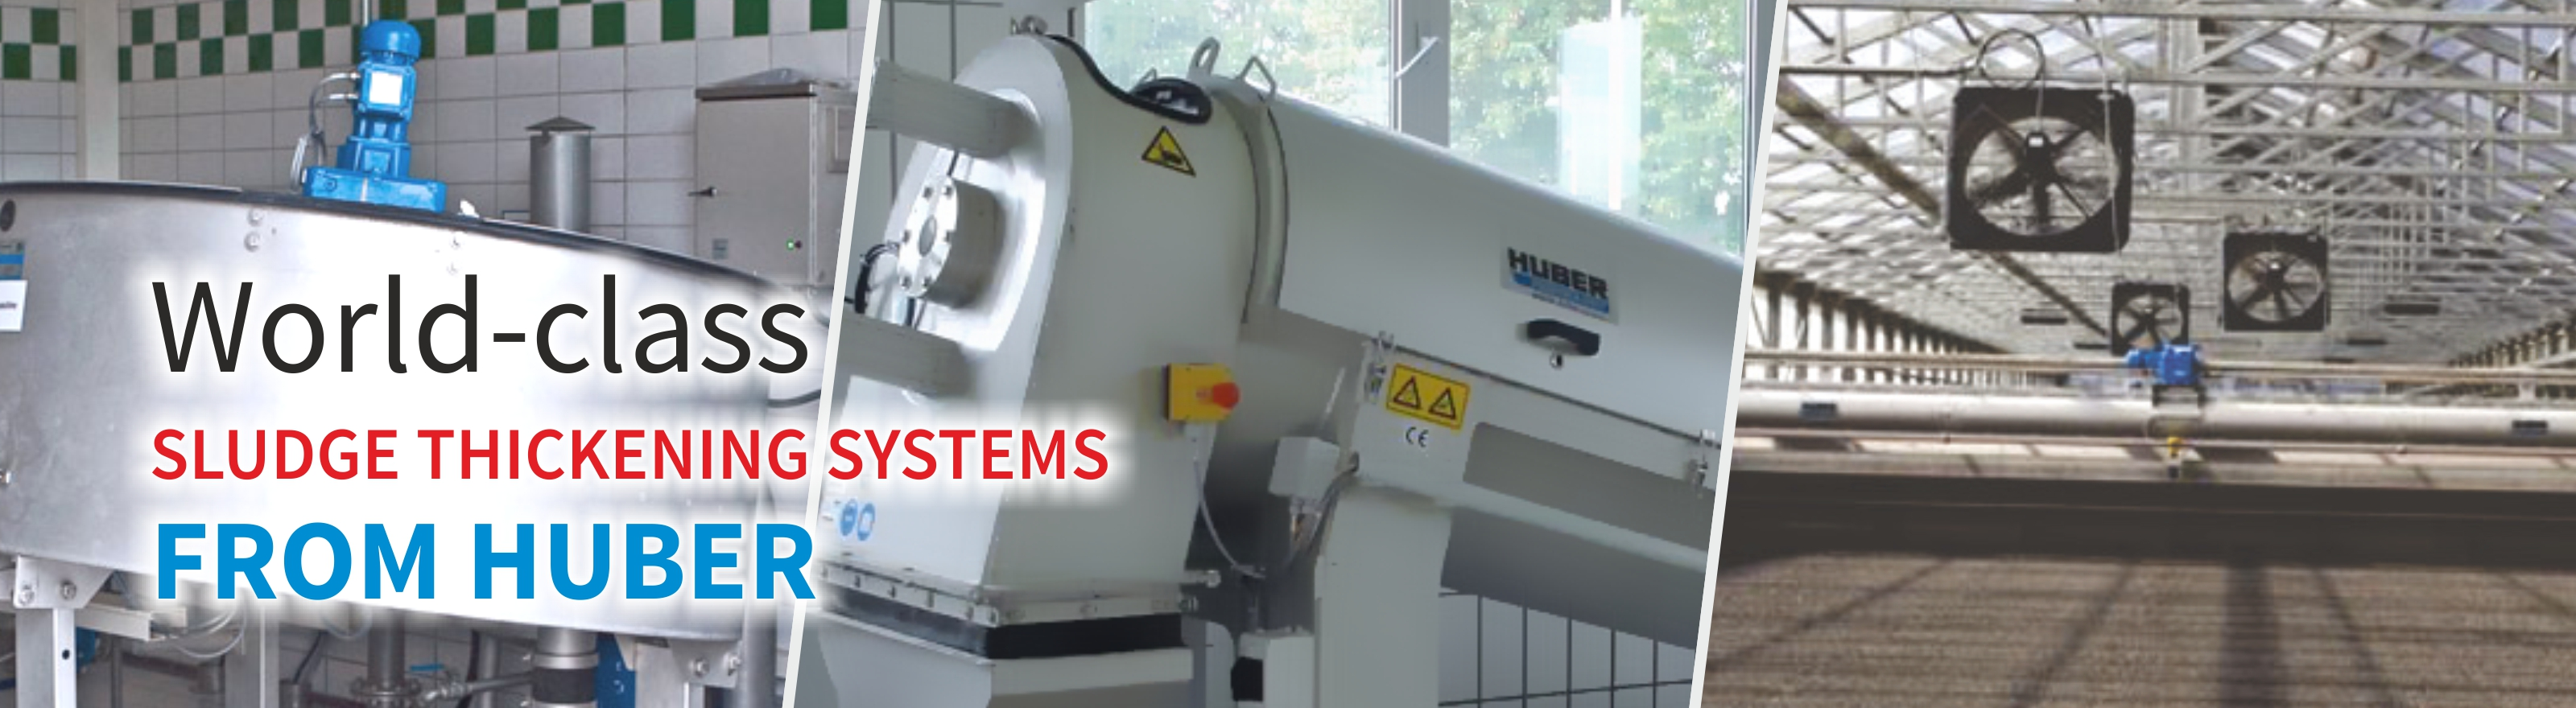 Huber Technologies